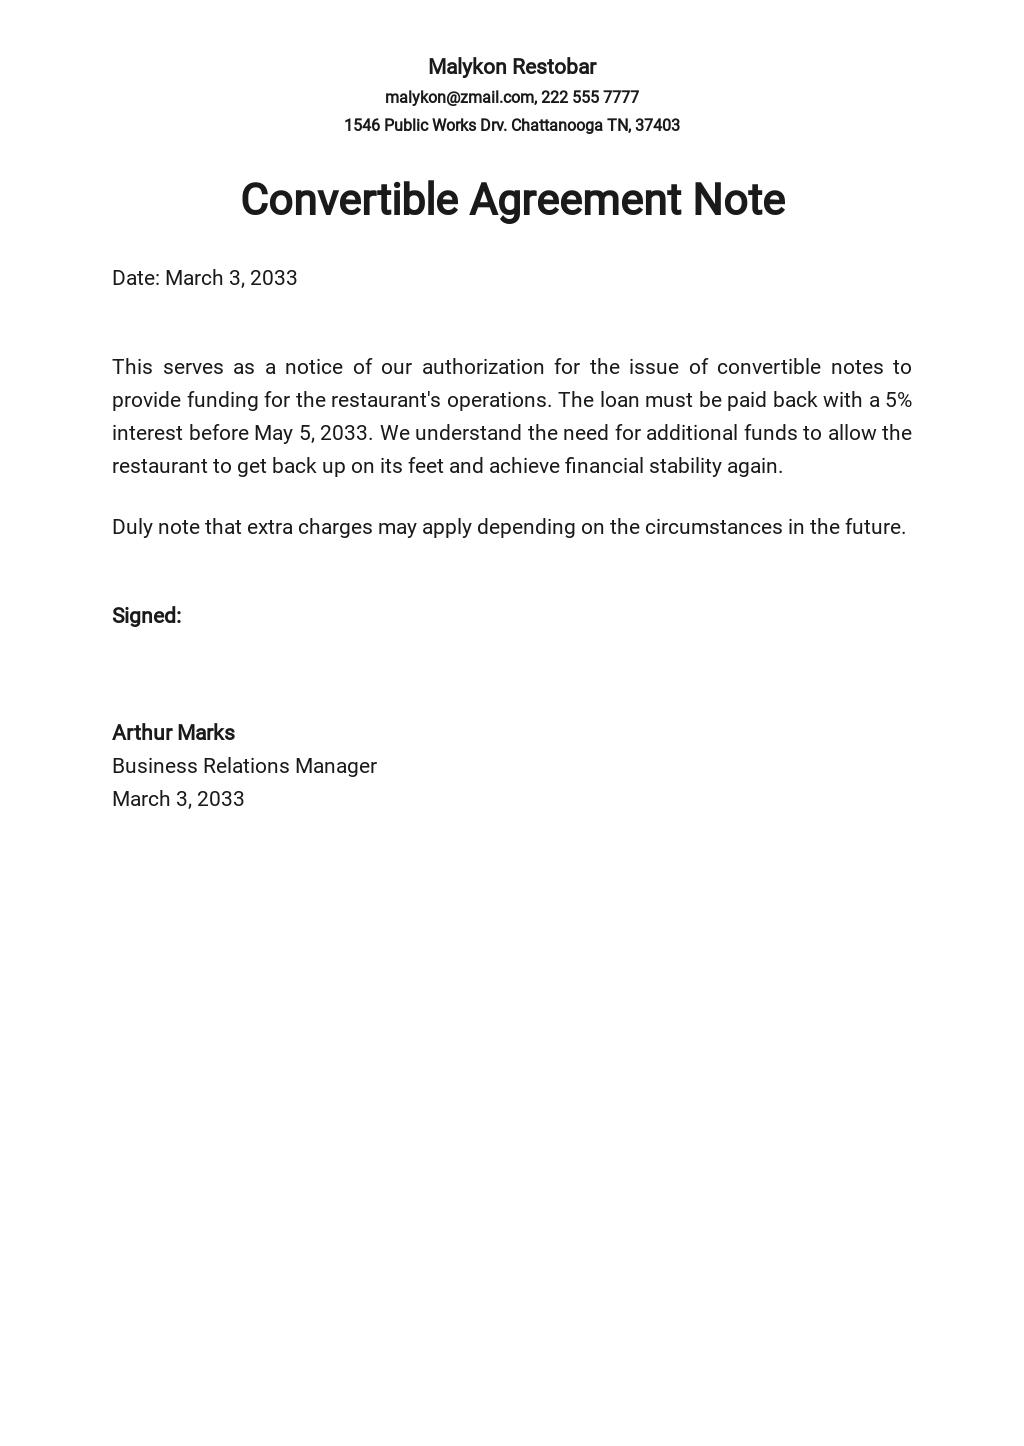 Restaurant Convertible Note Agreement Template